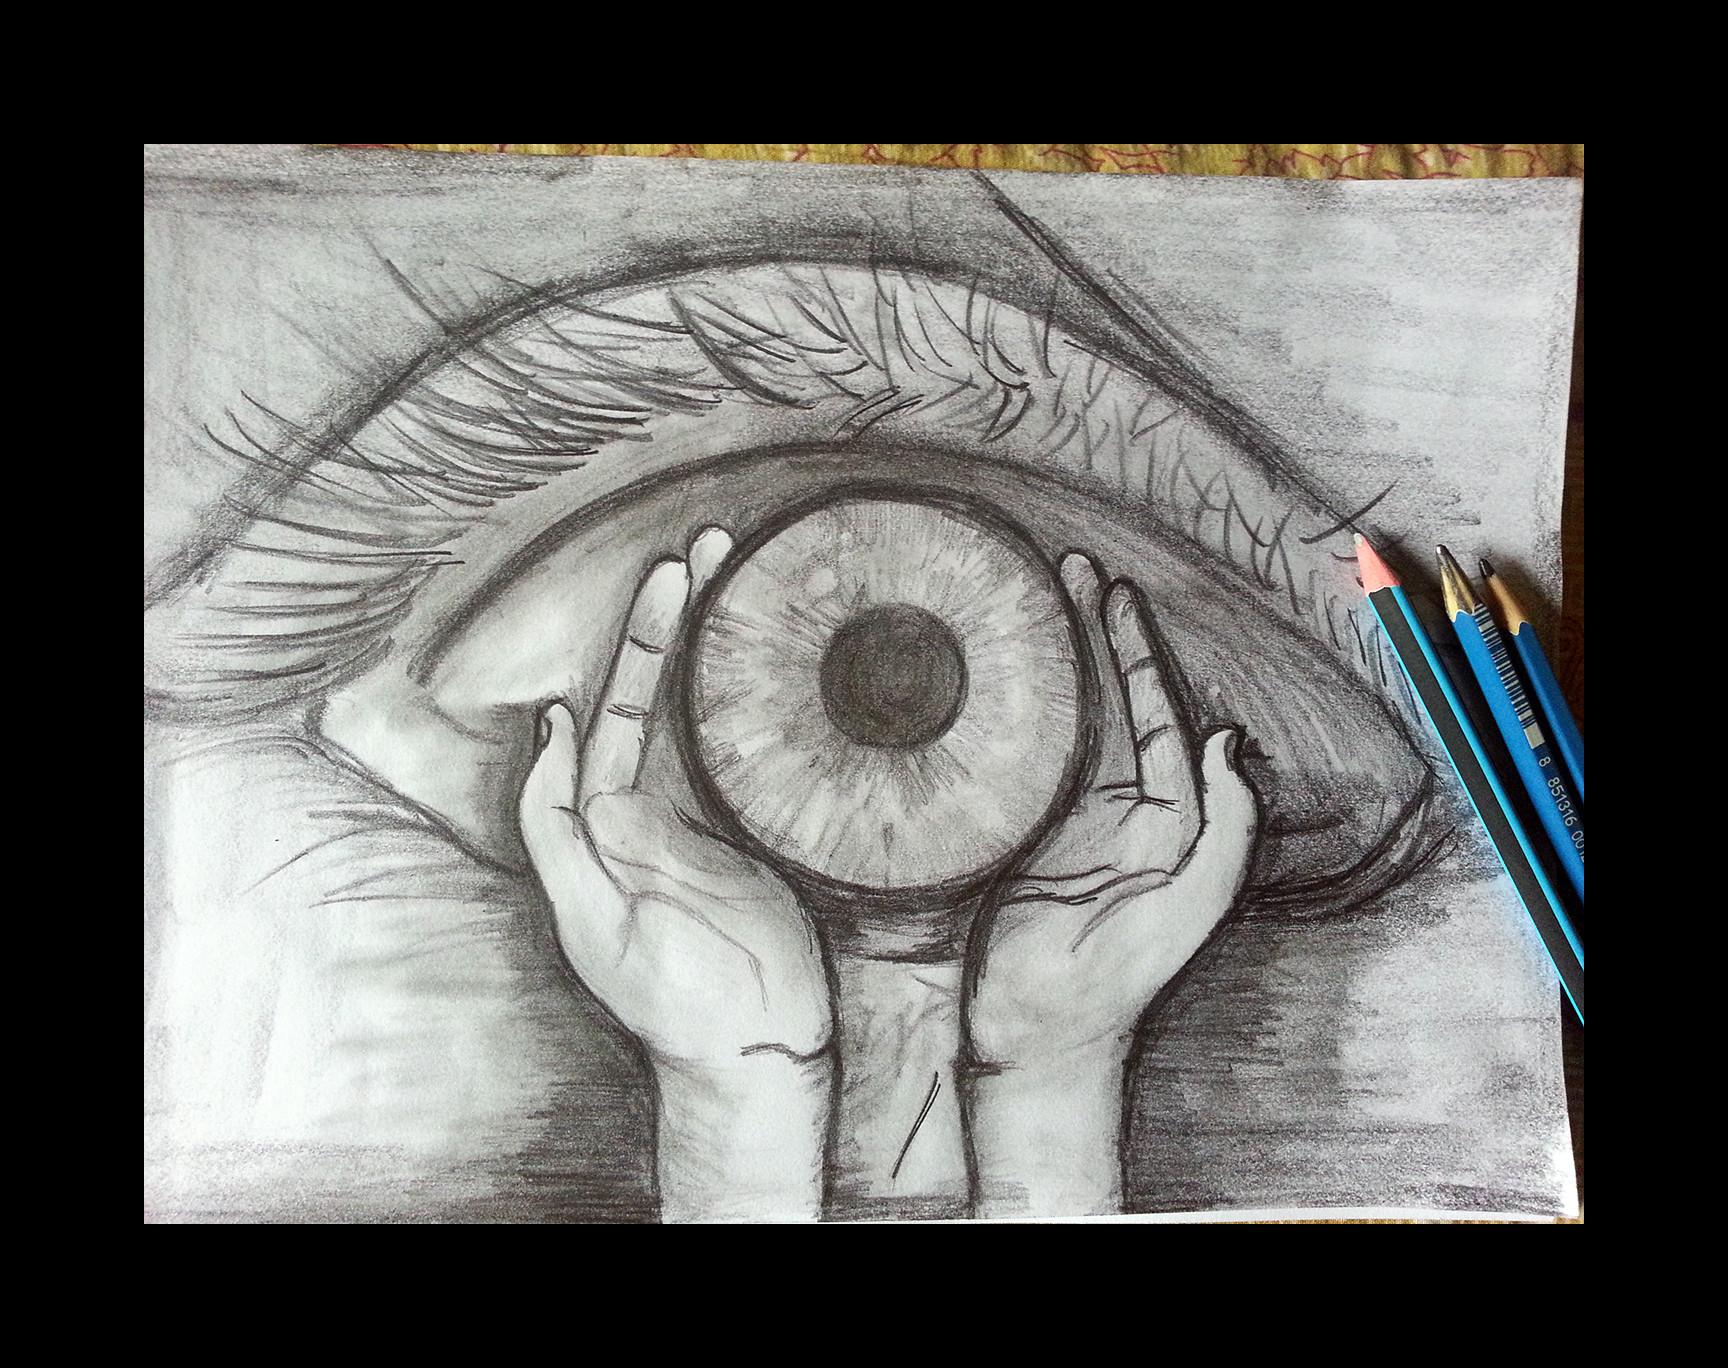 Pencil drawing thinking deeply